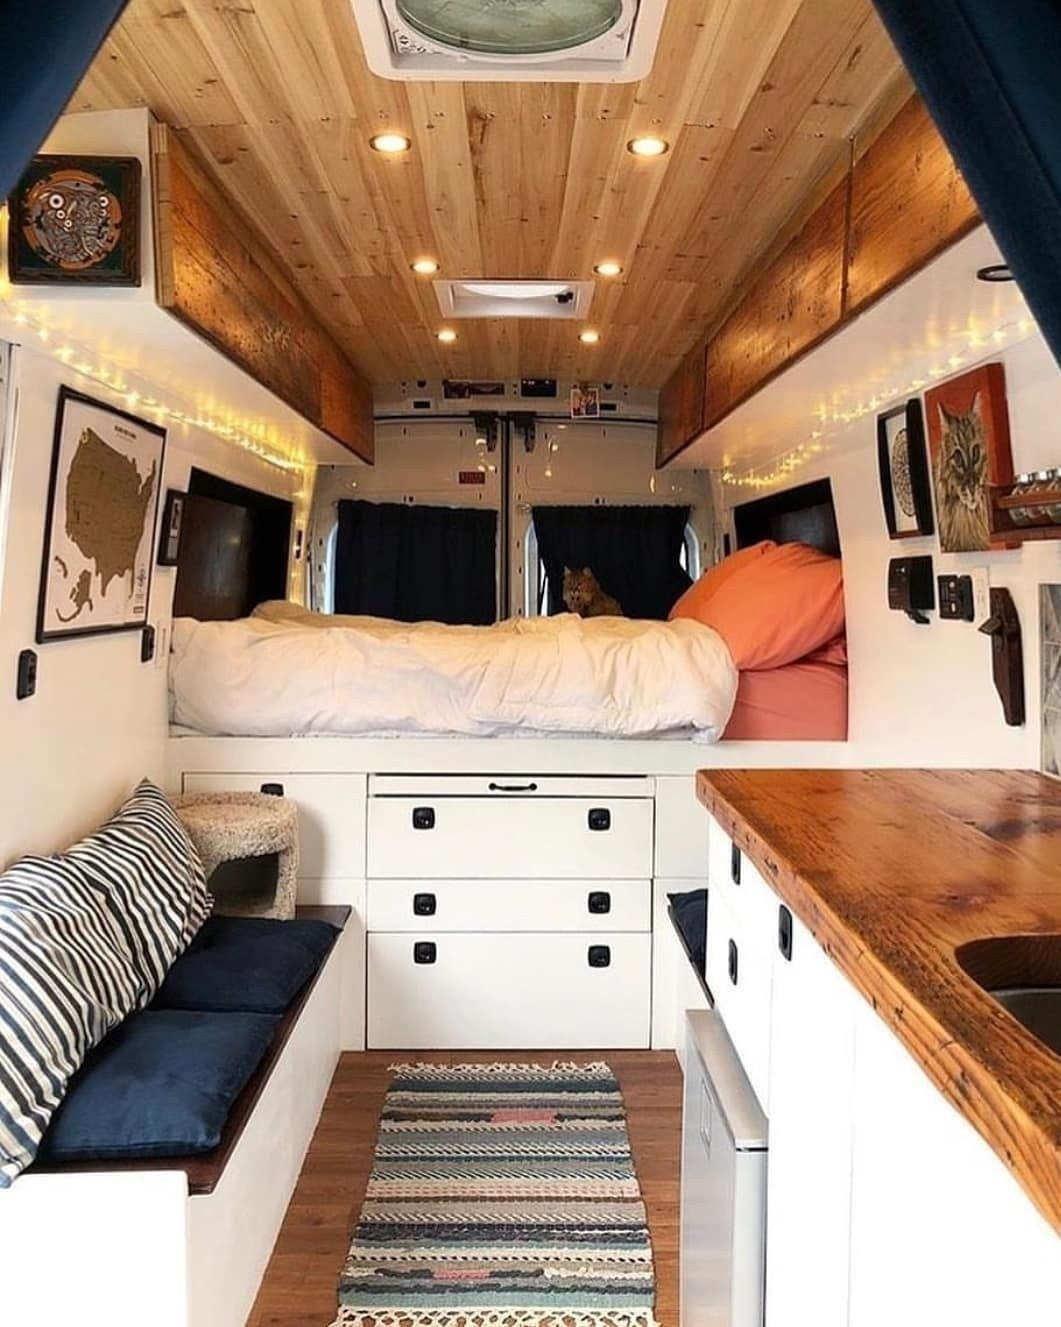 Easy Interior Design Ideas Bedroom: Simple Interior Design Ideas For Your RV 47